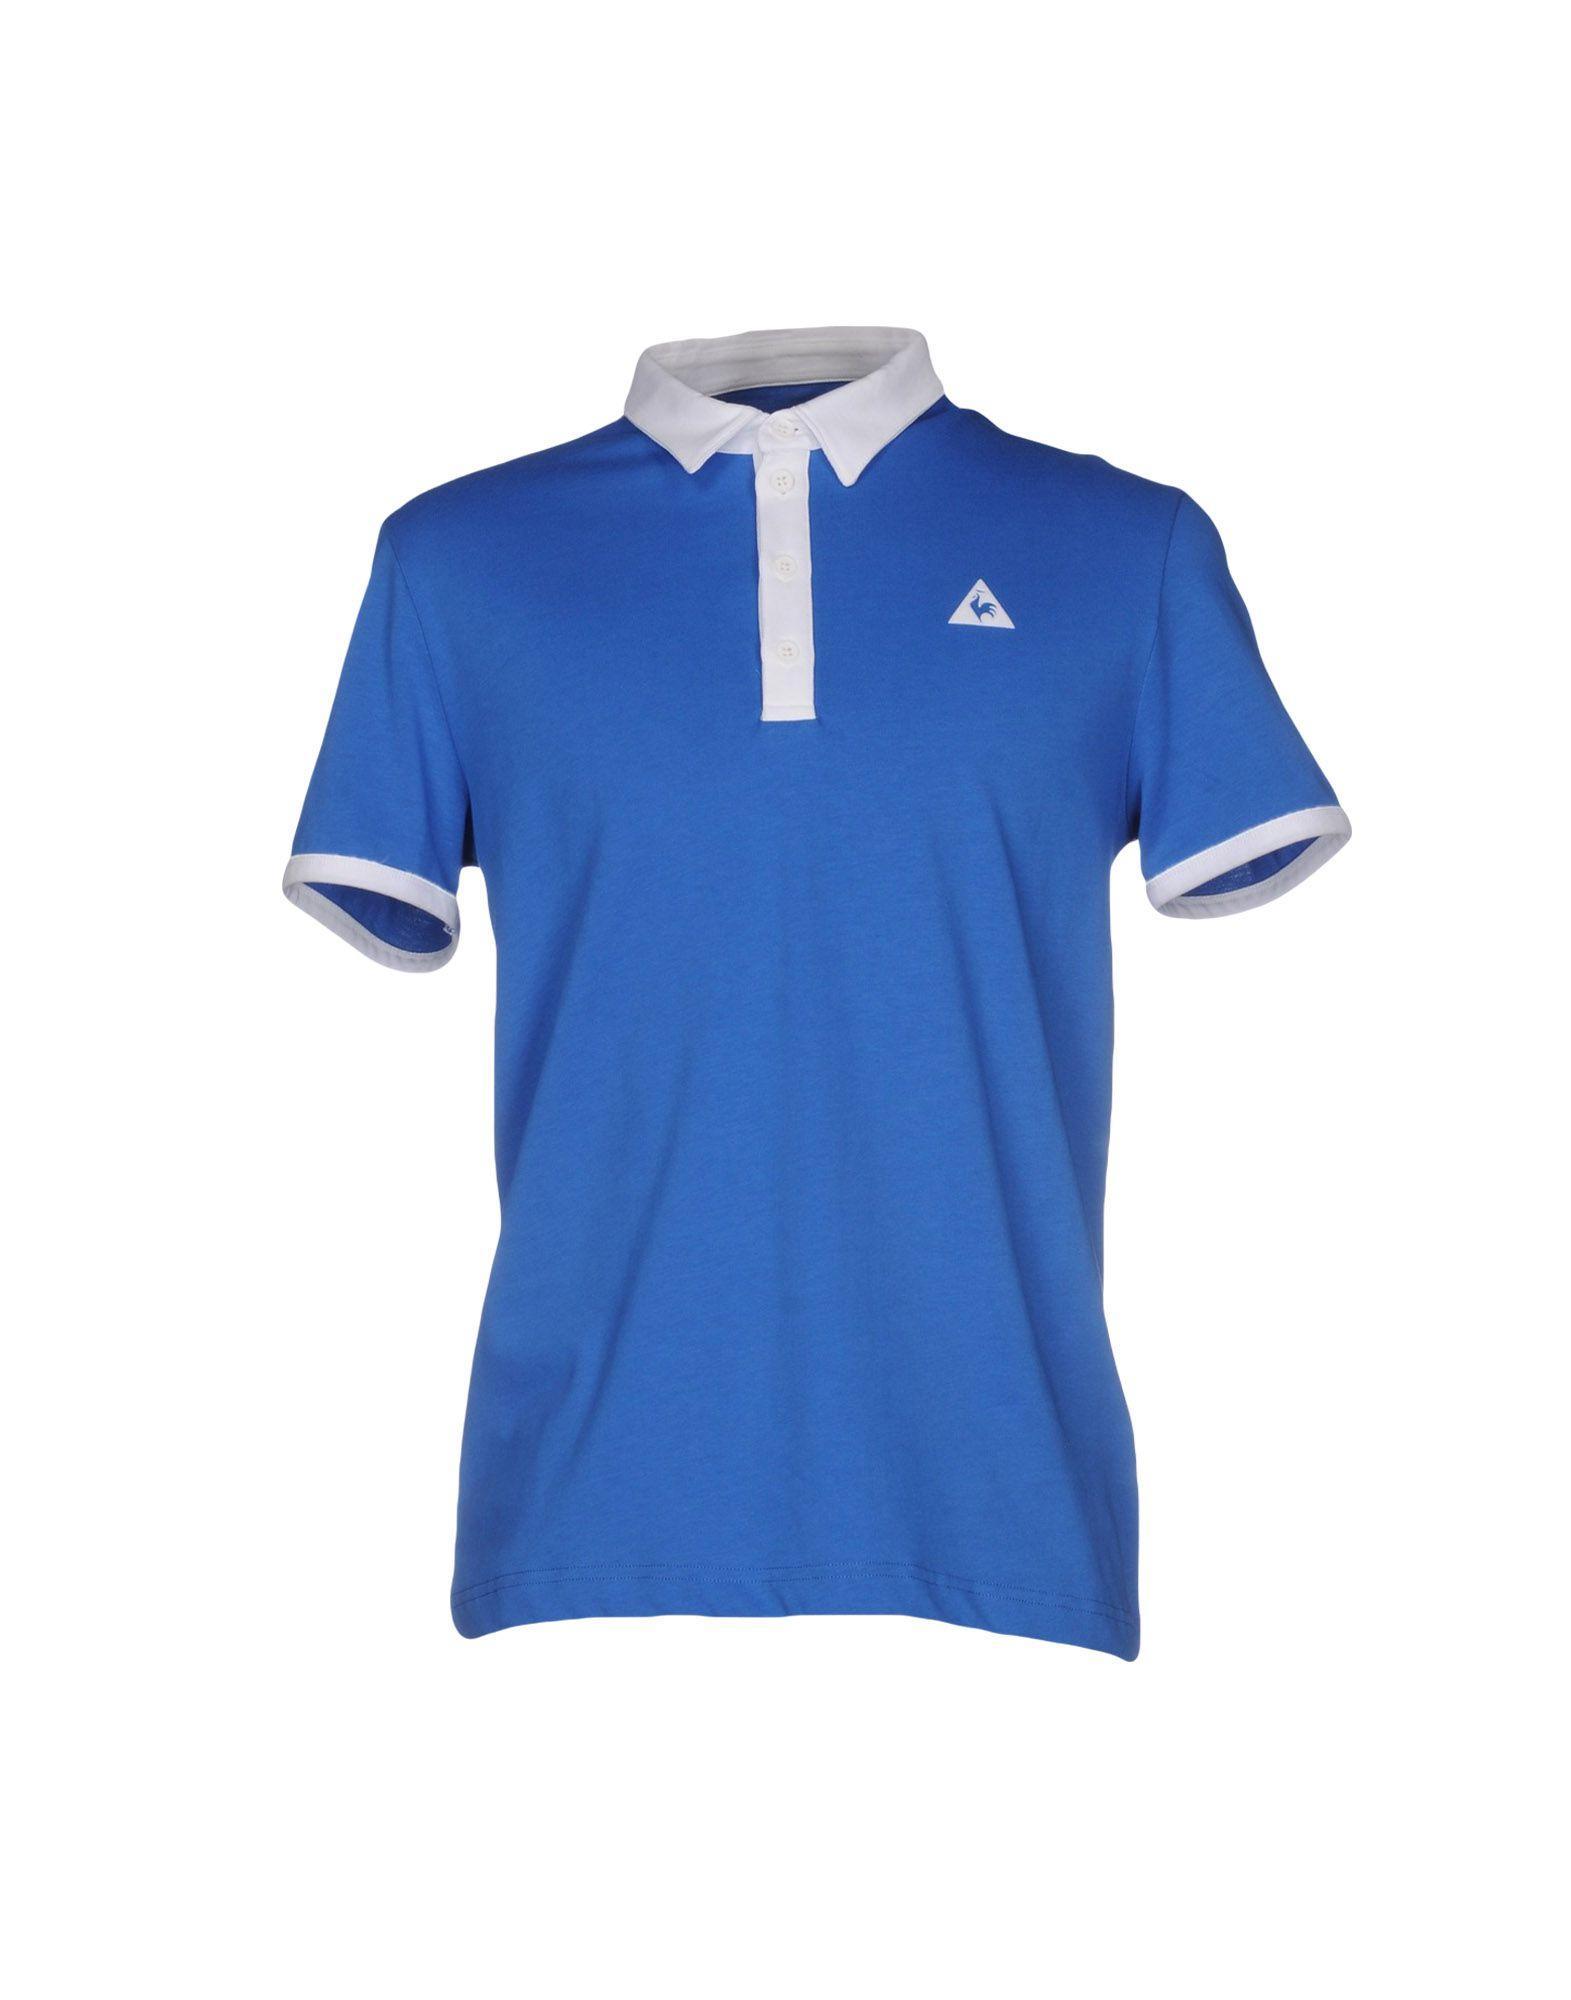 le coq sportif shirt - photo #13